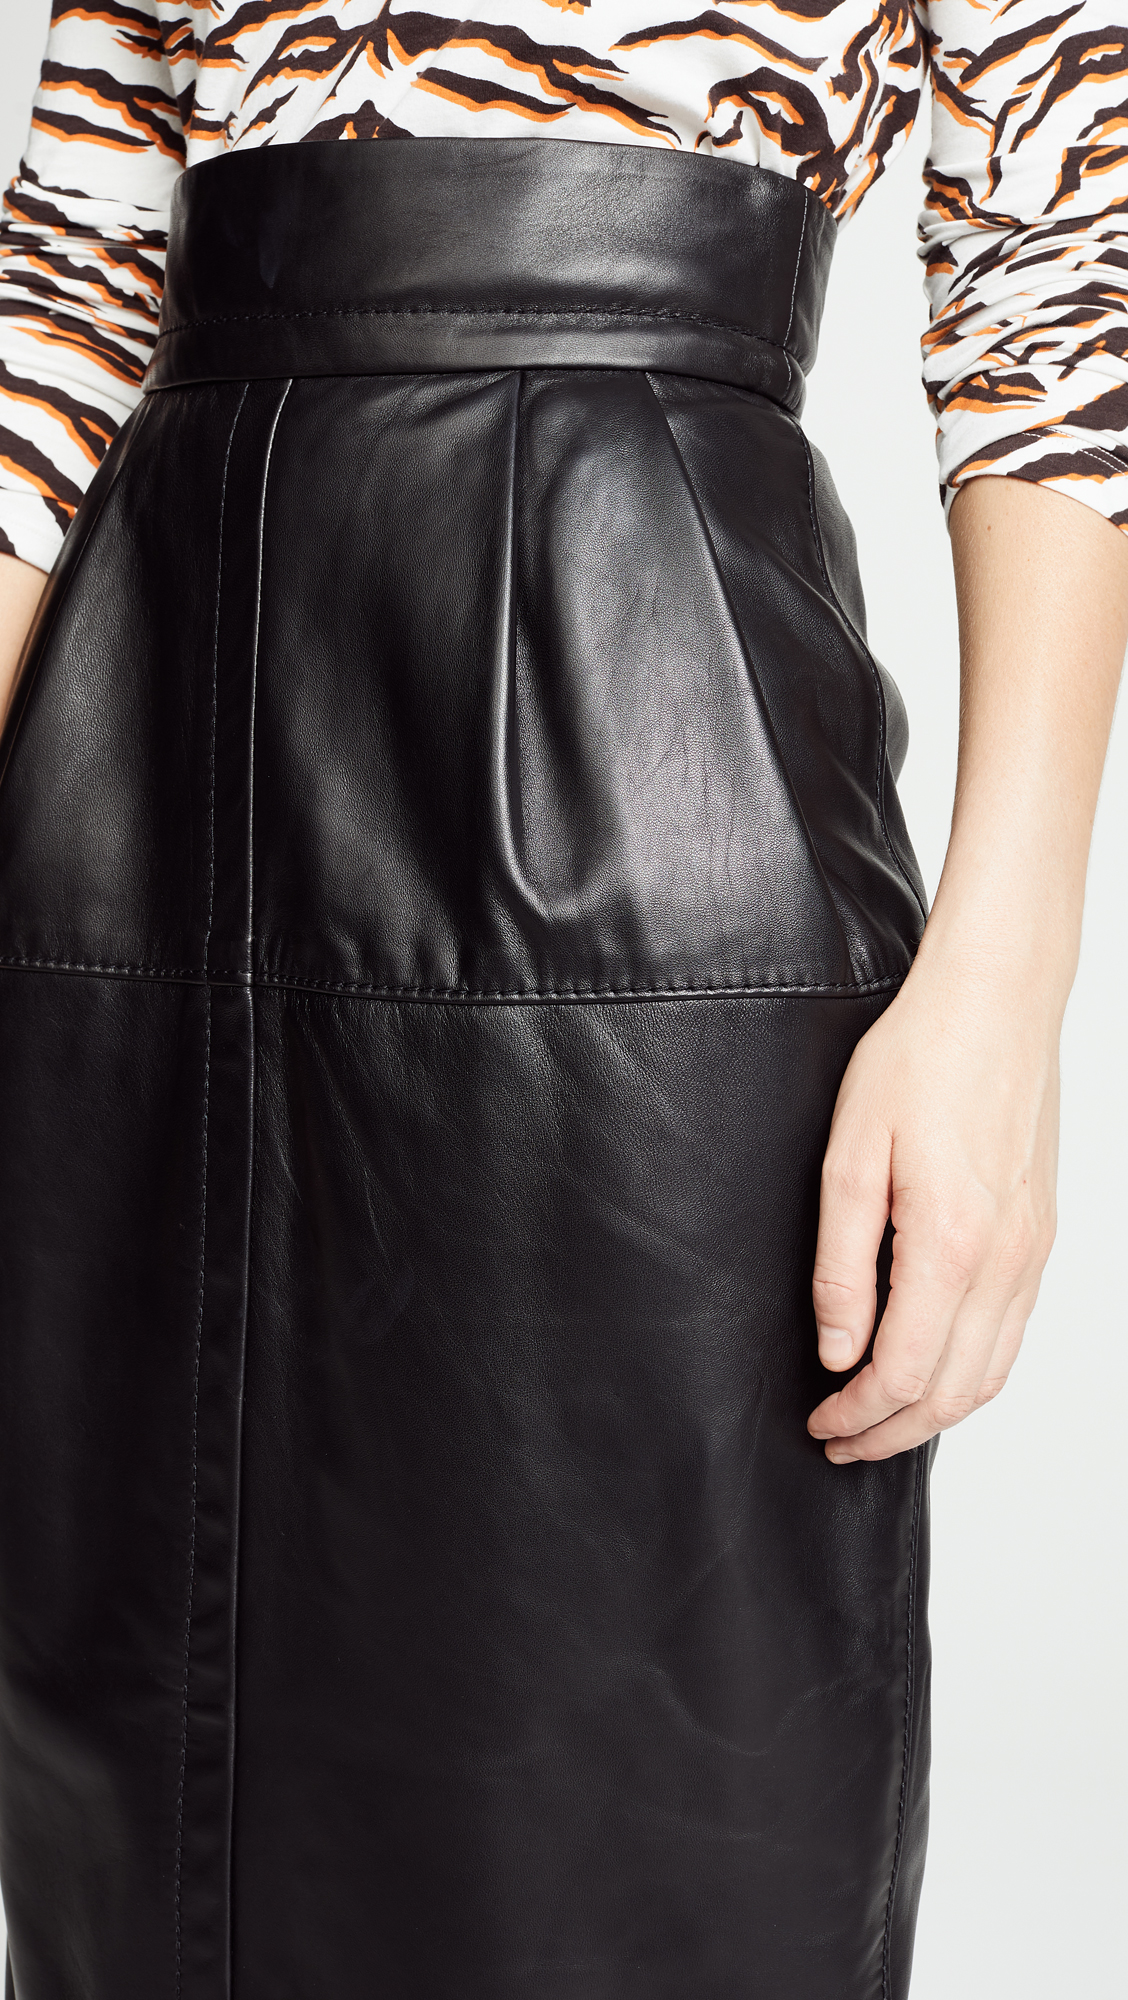 0375084e20 Marc Jacobs High Waisted Leather Skirt | SHOPBOP